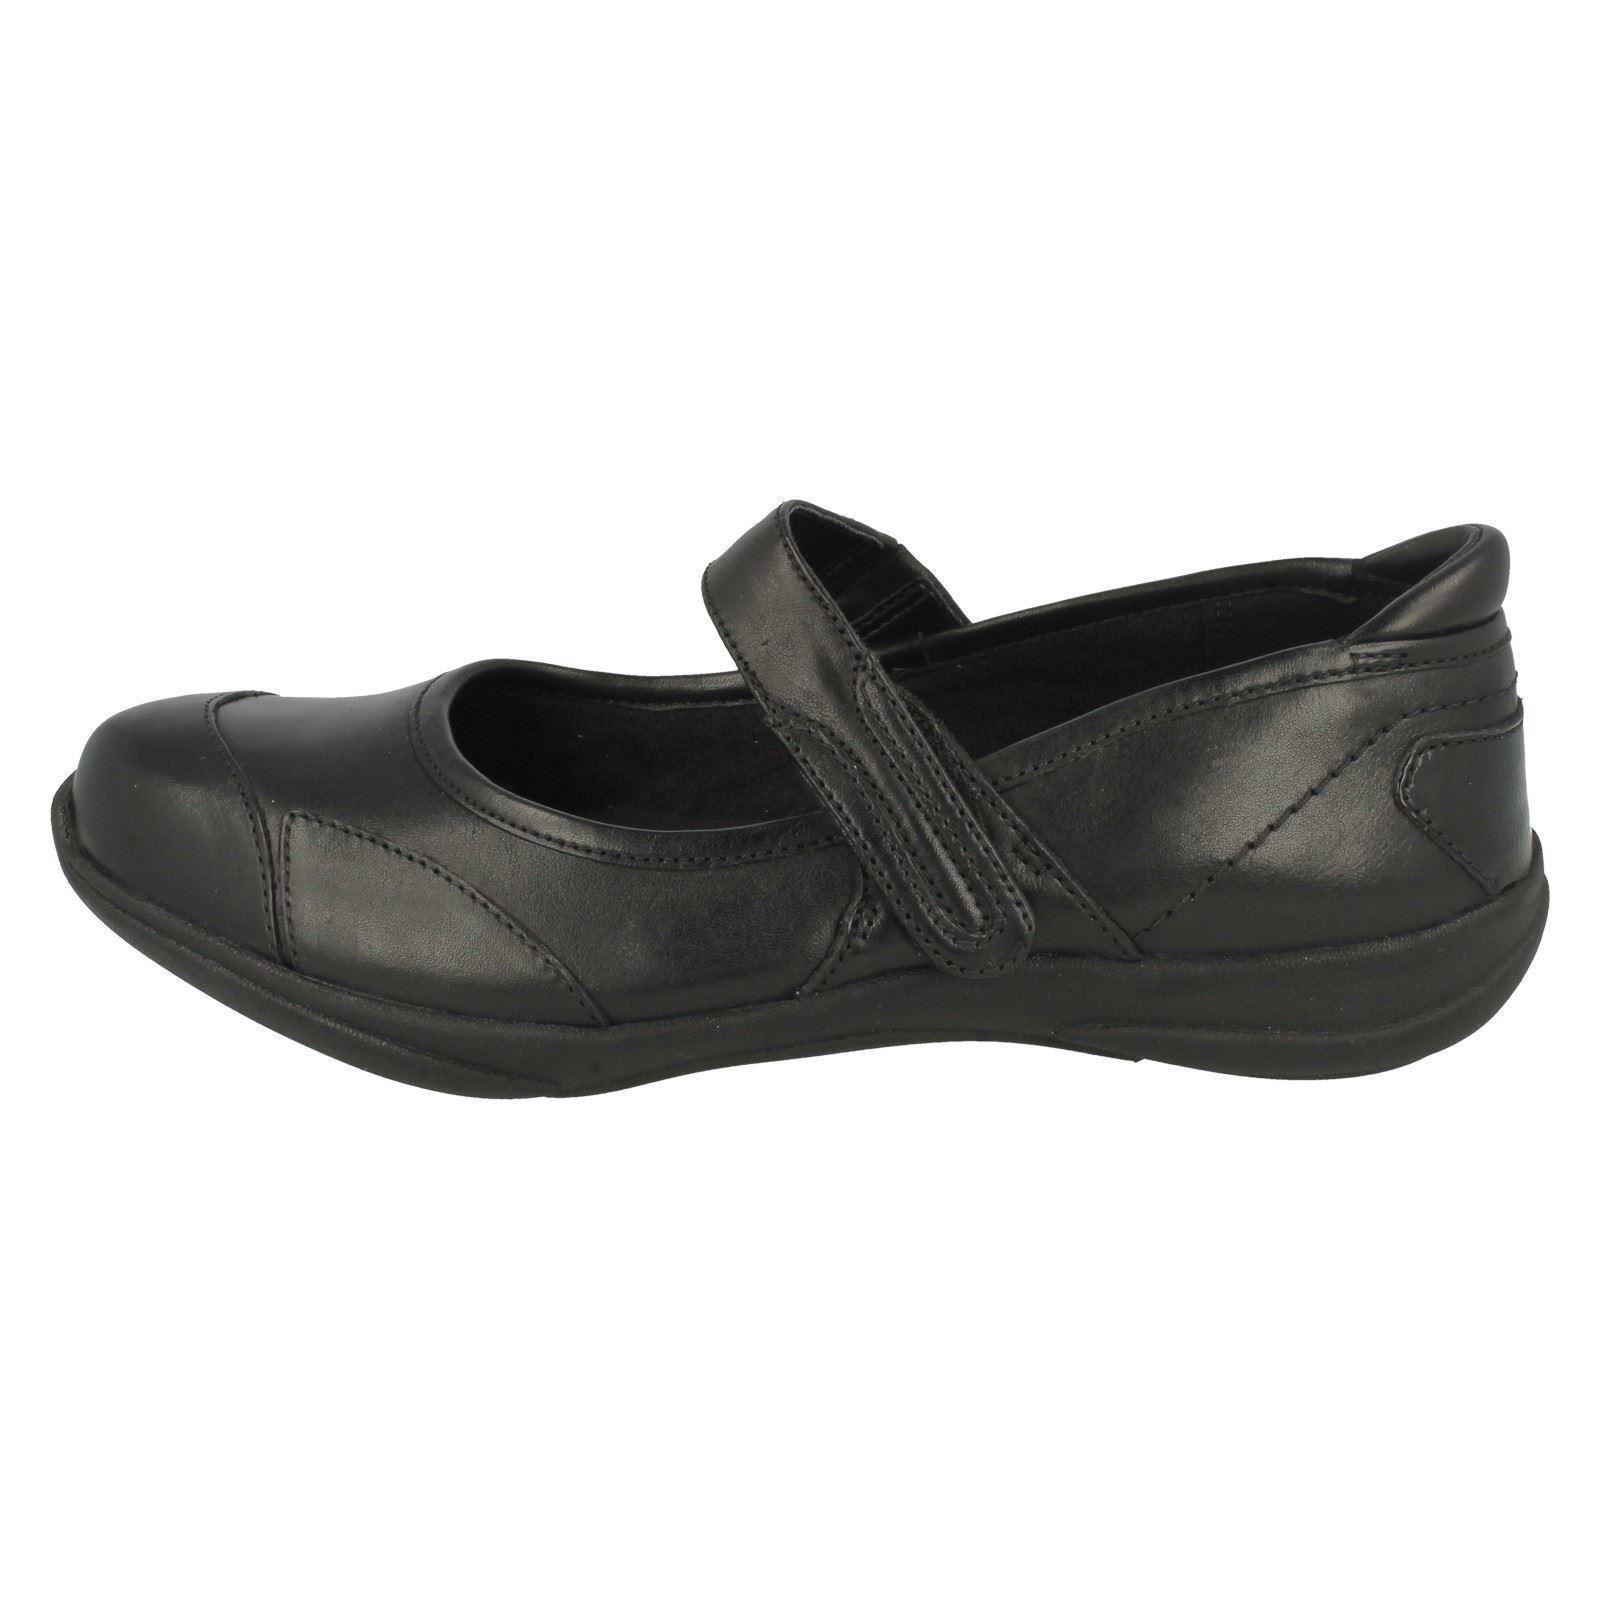 Clarks-da-donna-scarpe-in-pelle-039-Etna-Verde-Lime-039